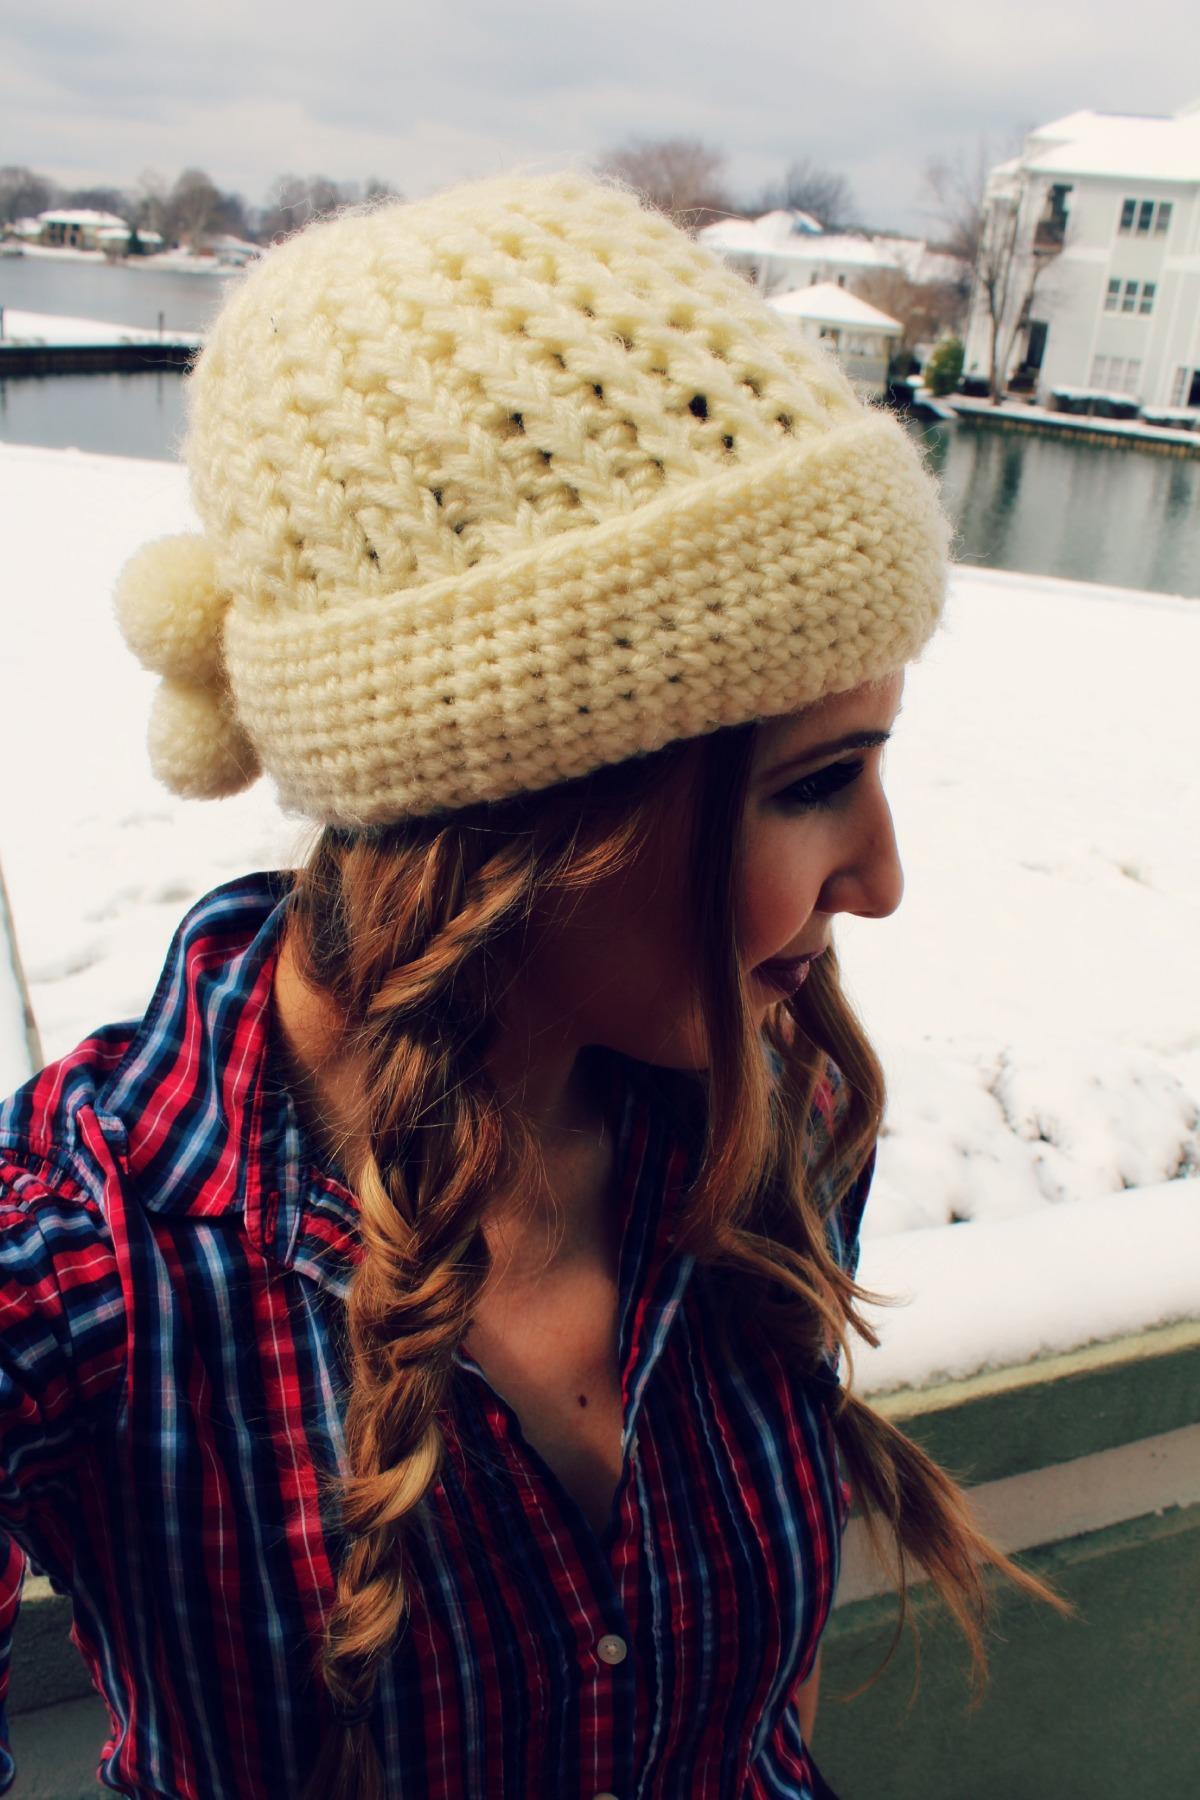 snow day - Joanna 1181